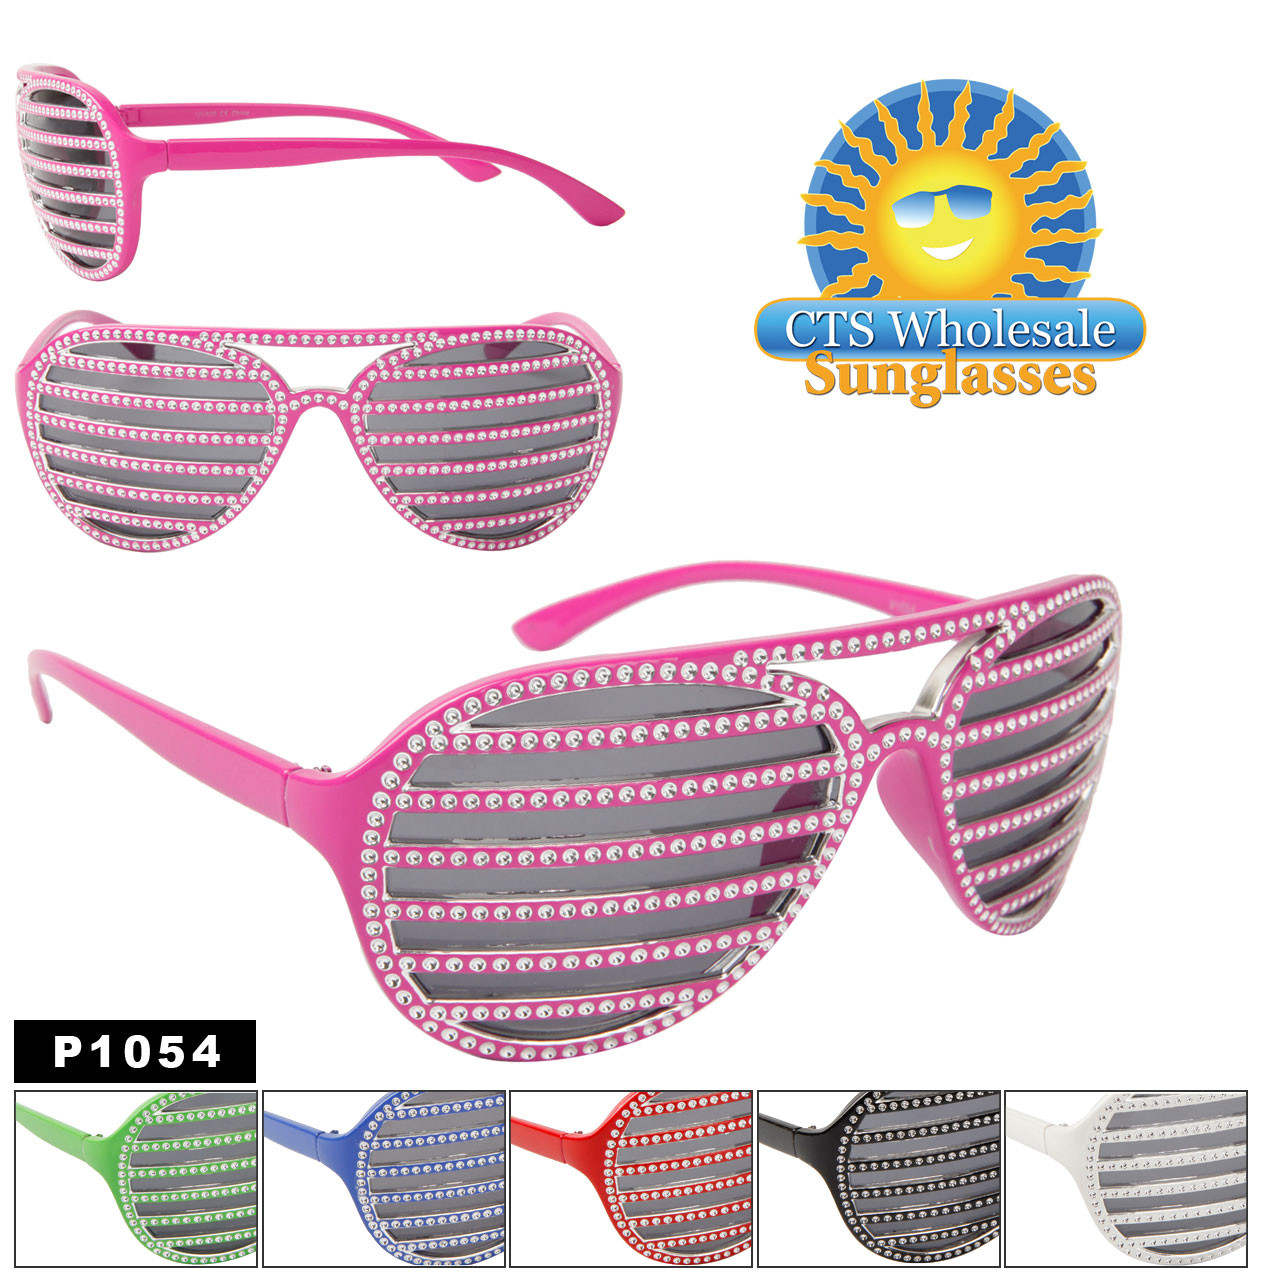 Faux Rhinestone Shutter Shades P1054 (12 pcs.) (Assorted Colors)